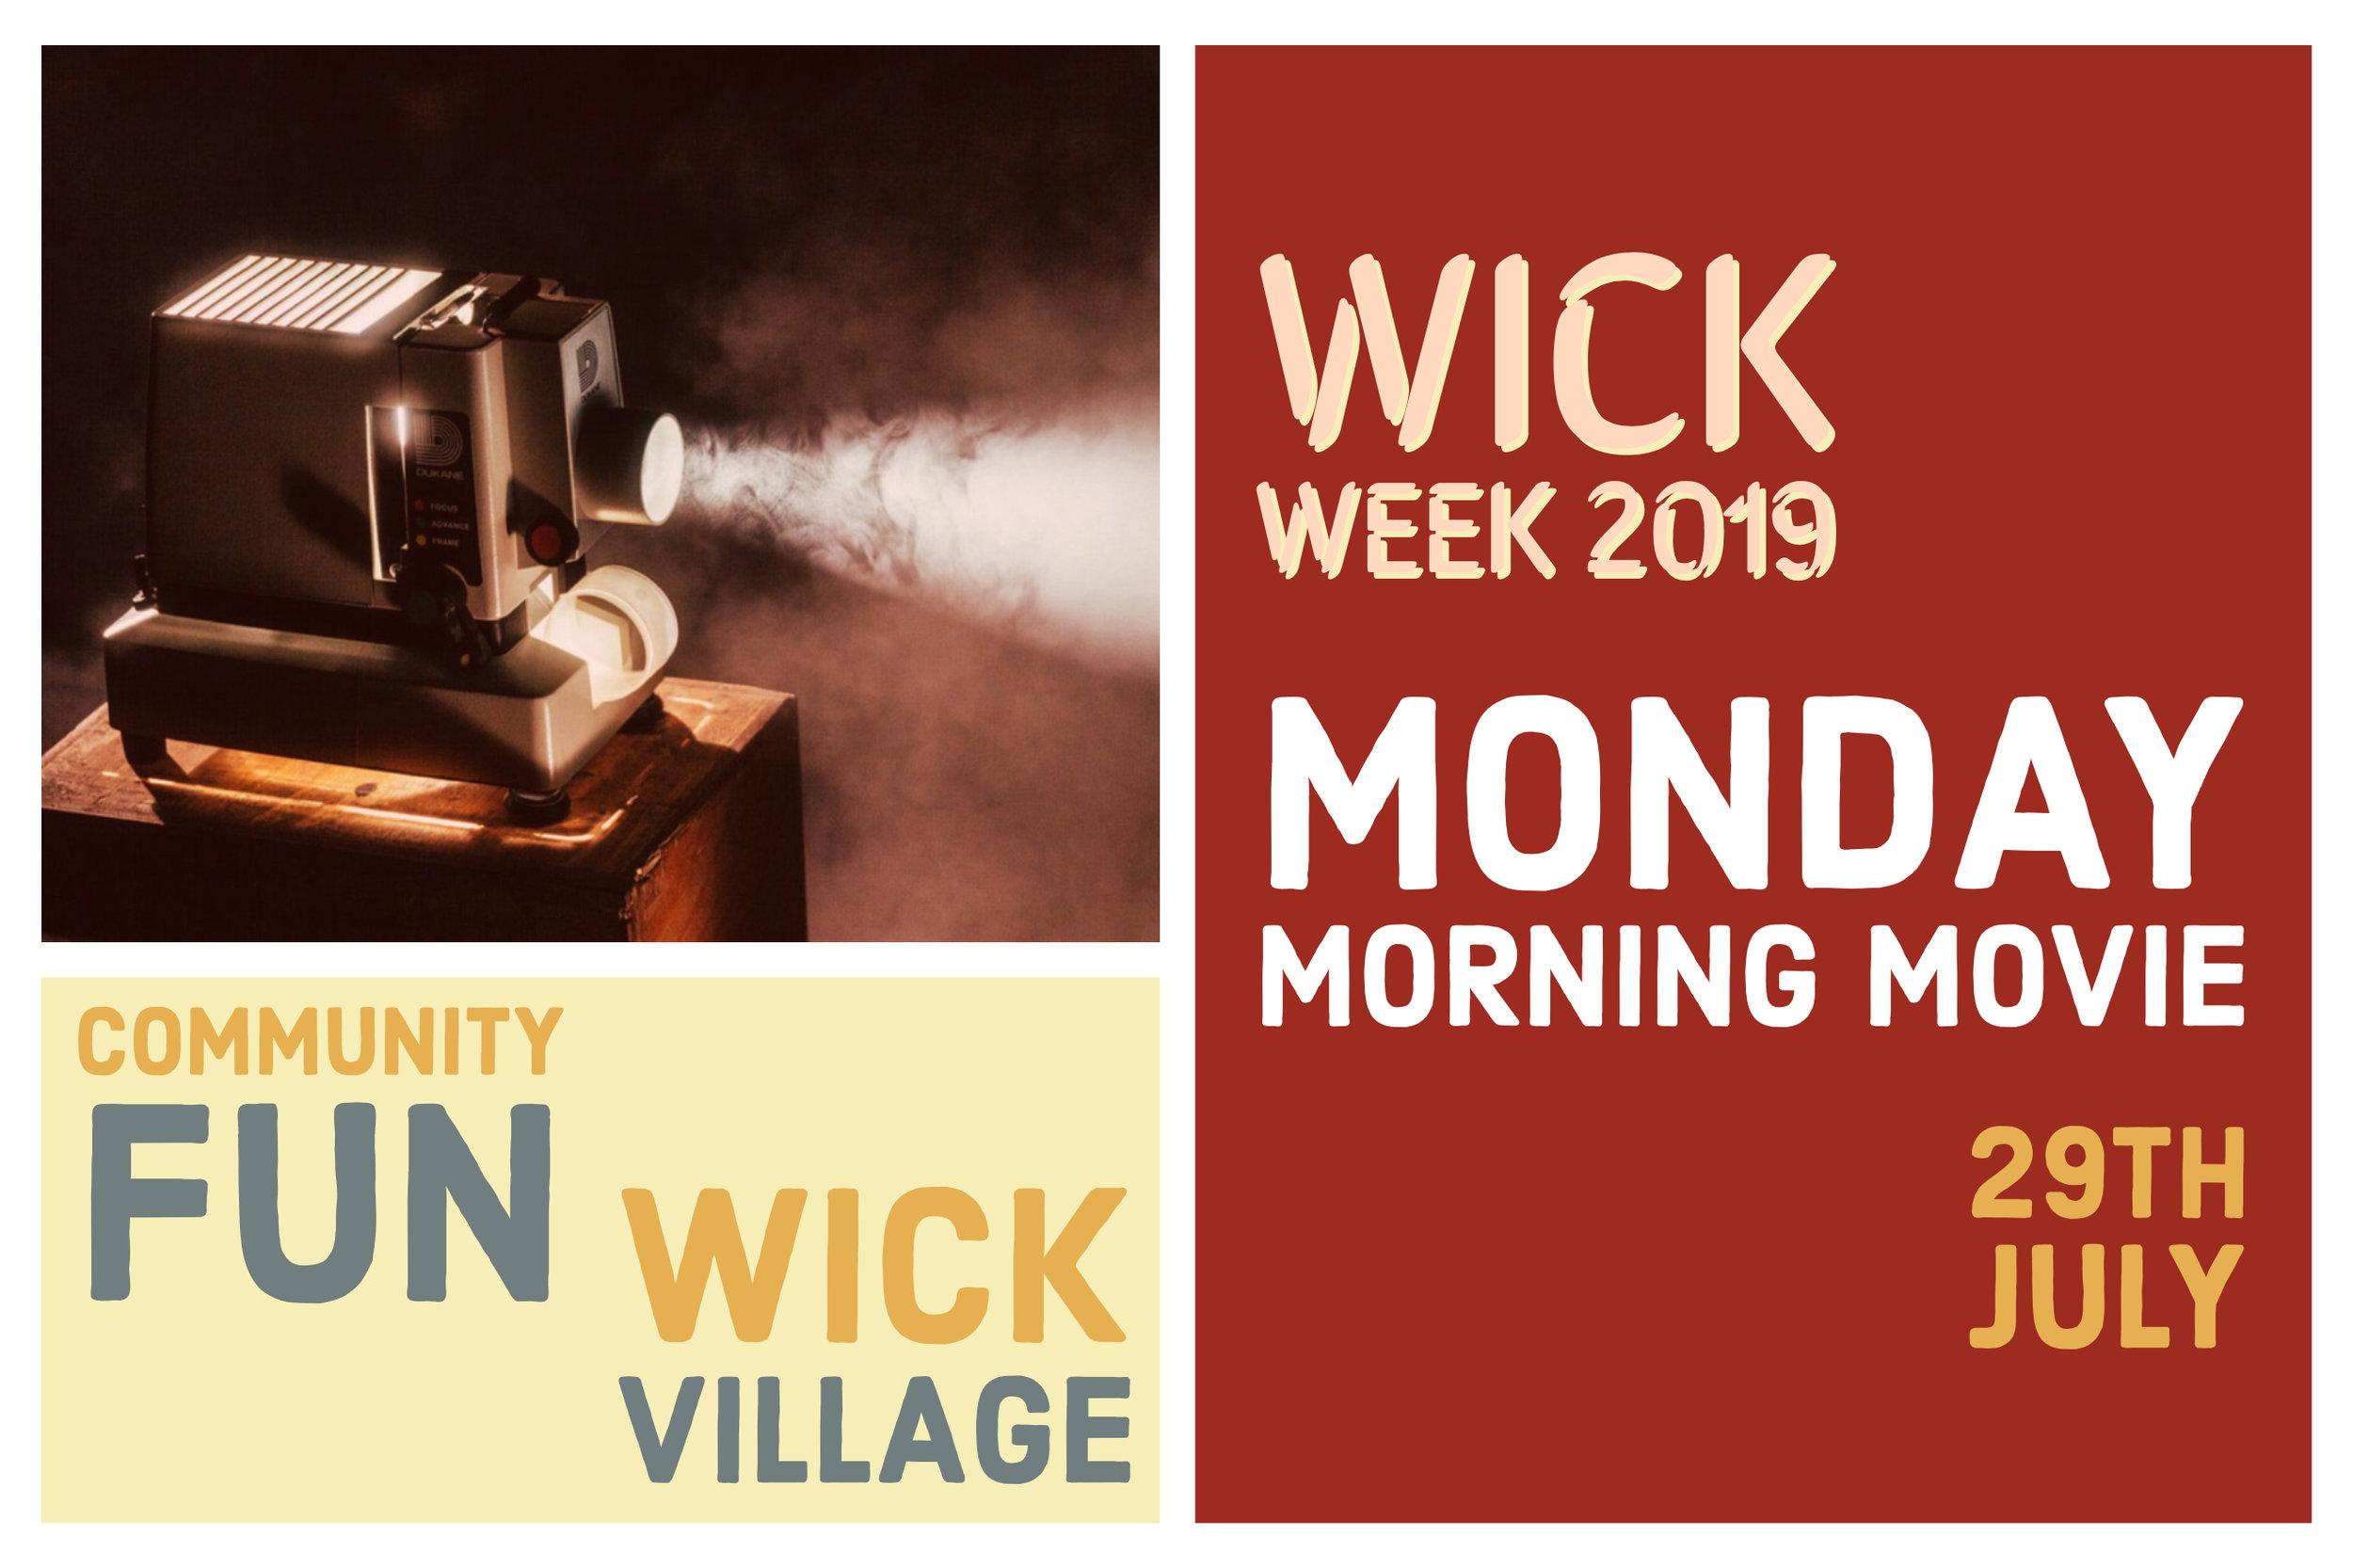 Wick Week 2019 - Monday Morning Movie.